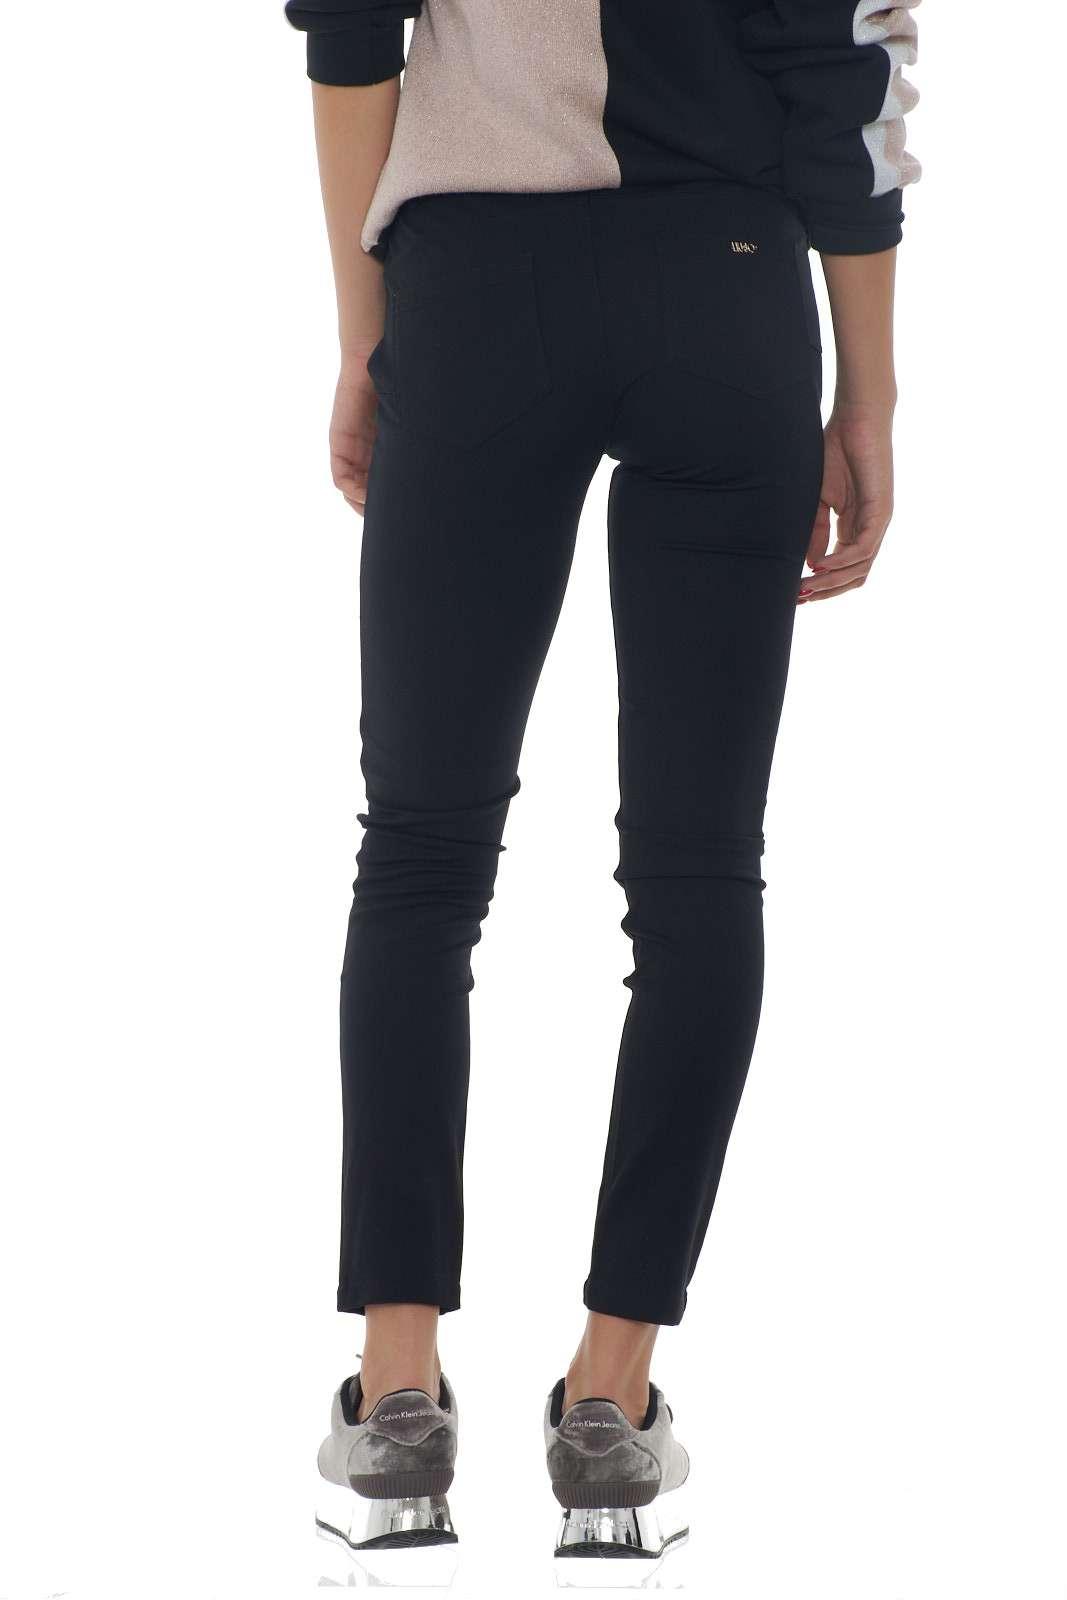 https://www.parmax.com/media/catalog/product/a/i/AI-outlet_parmax-pantaloni-donna-Liu-Jo-T69033-C.jpg